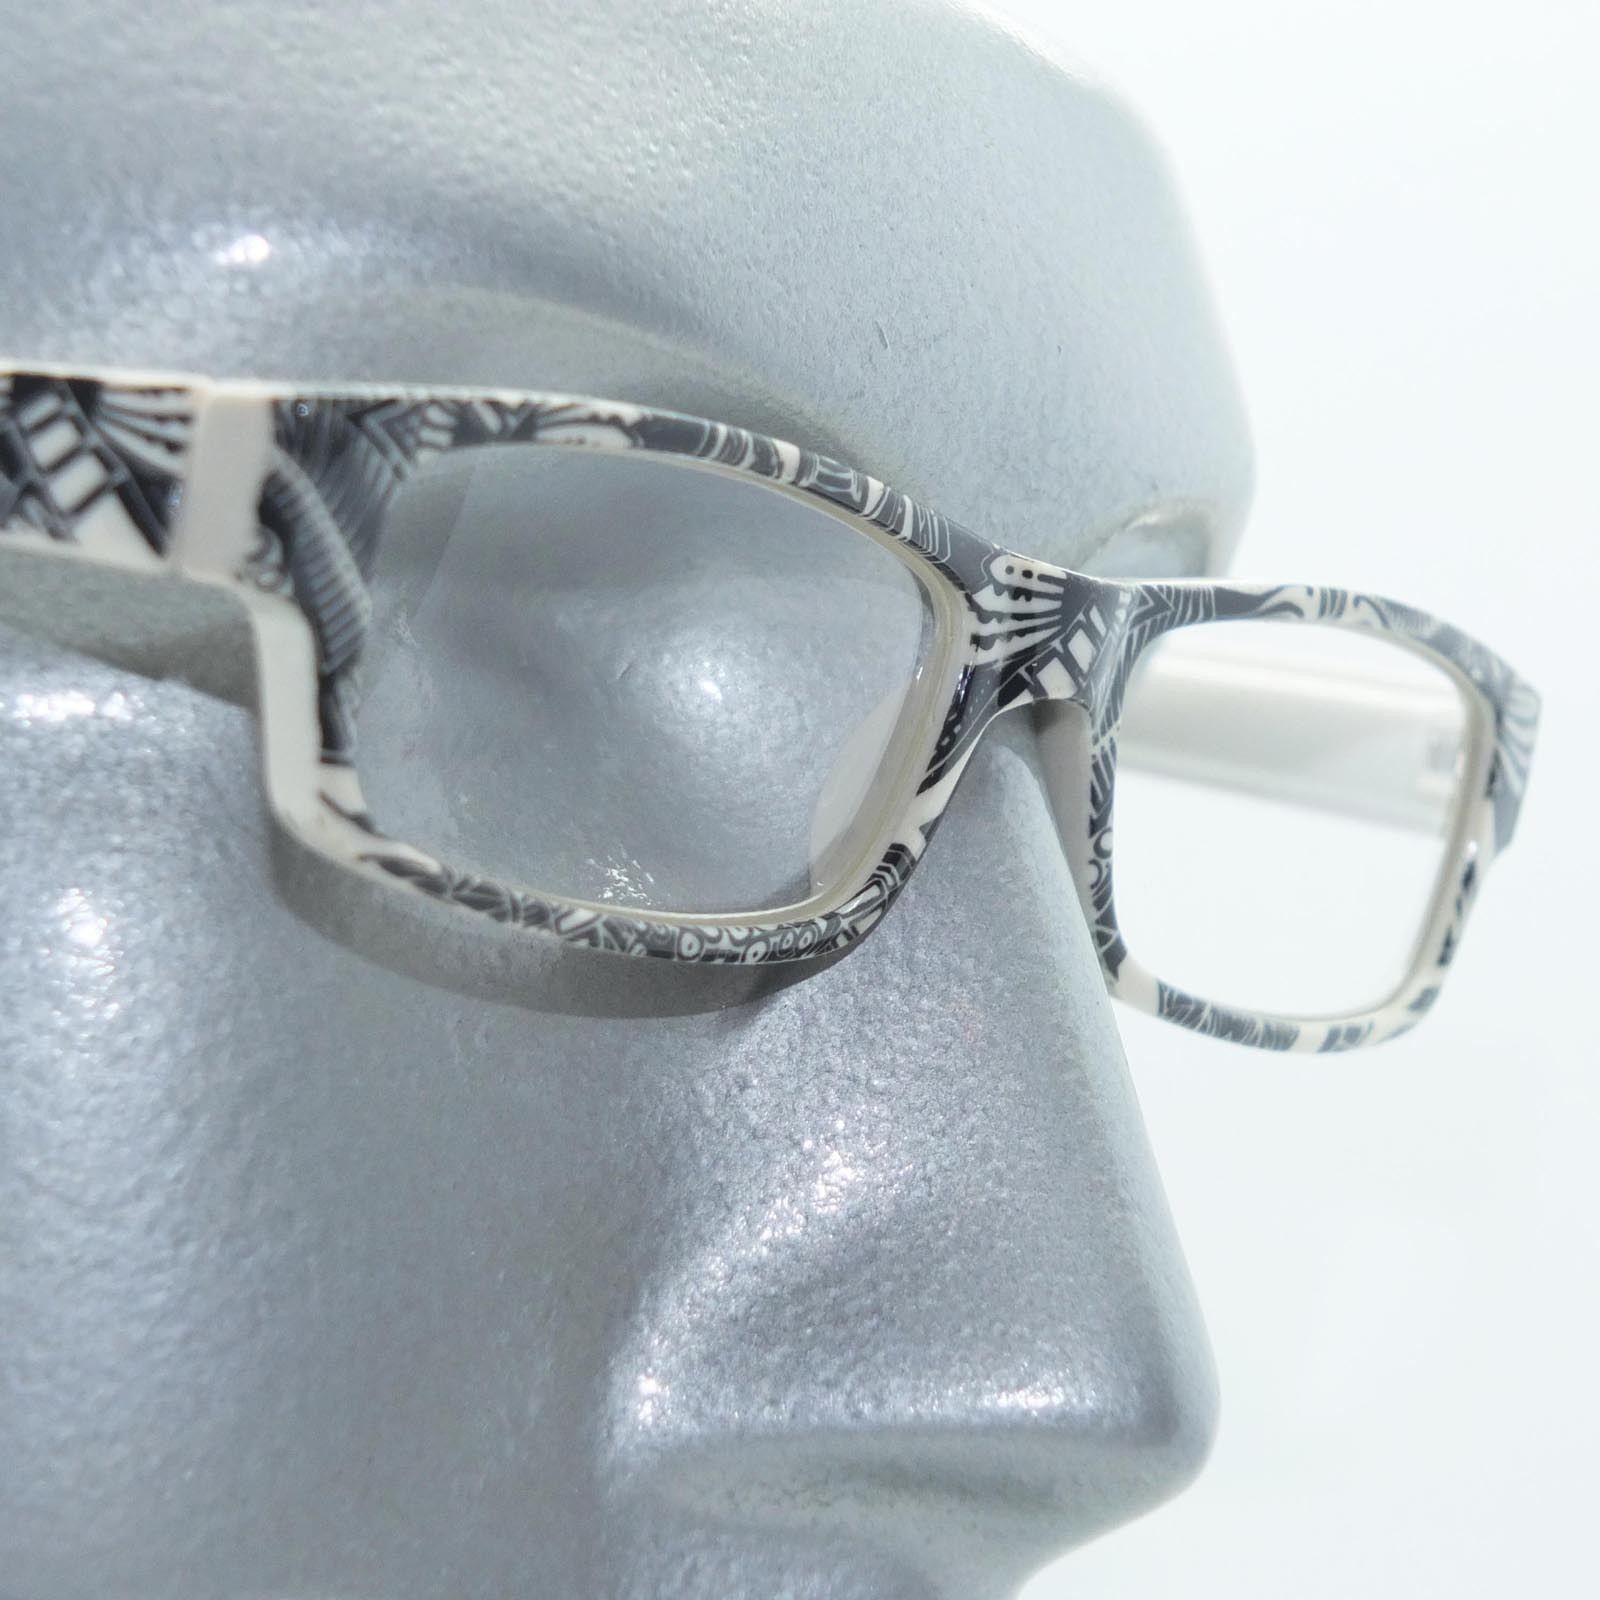 Eyeglass Frame Tattoo : Reading Glasses Sharp Ink Style Tattoo Graffiti Frame +1 ...